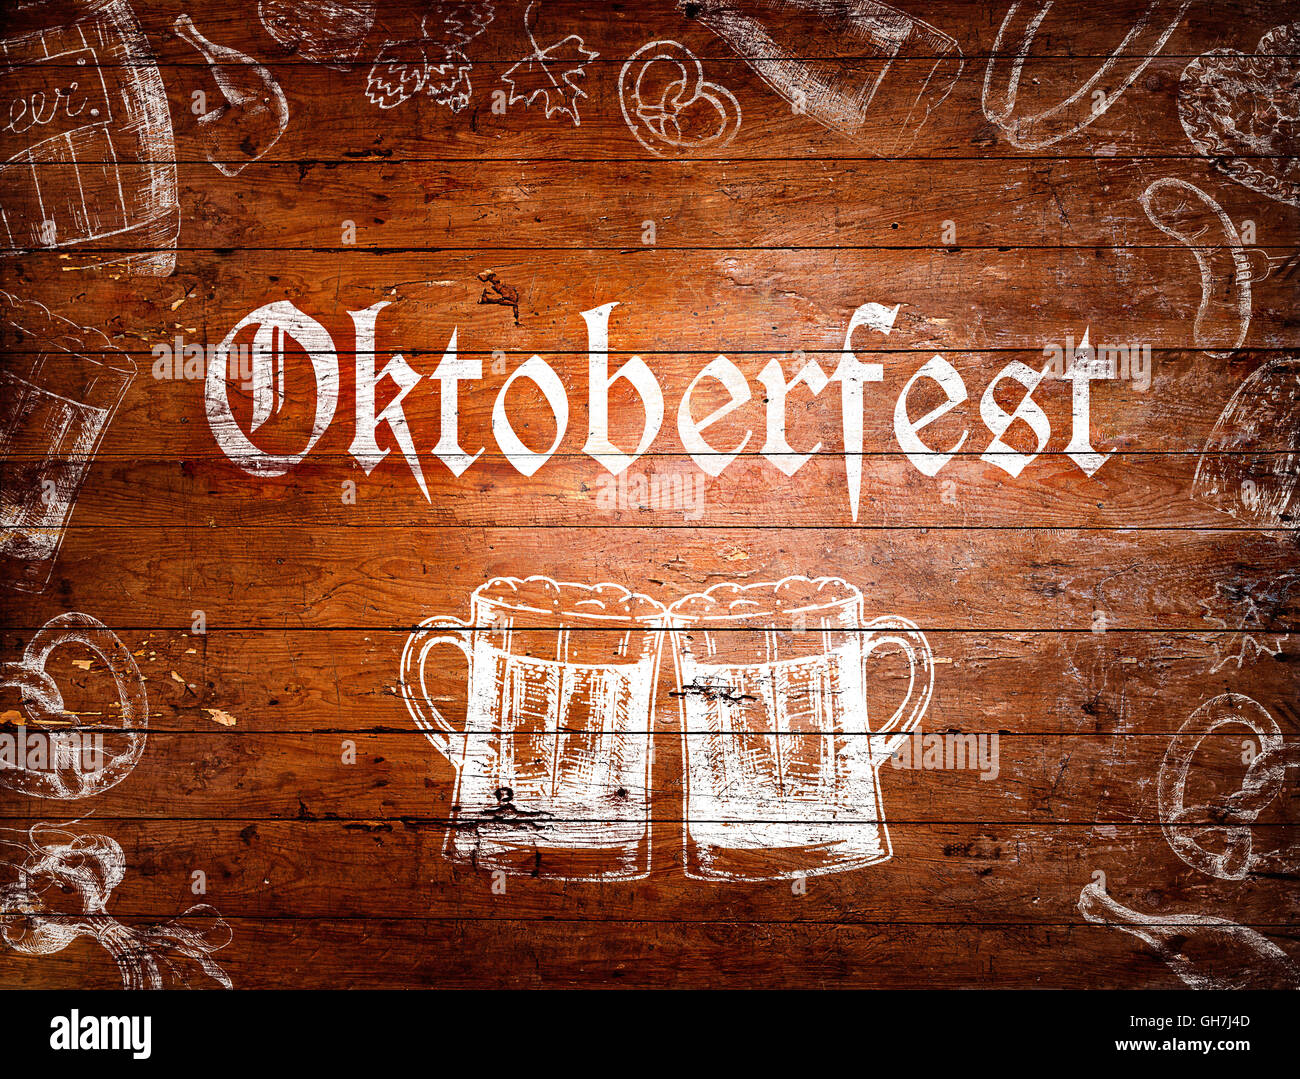 Oktoberfest sign, beer mugs, chalk drawings, wooden ...